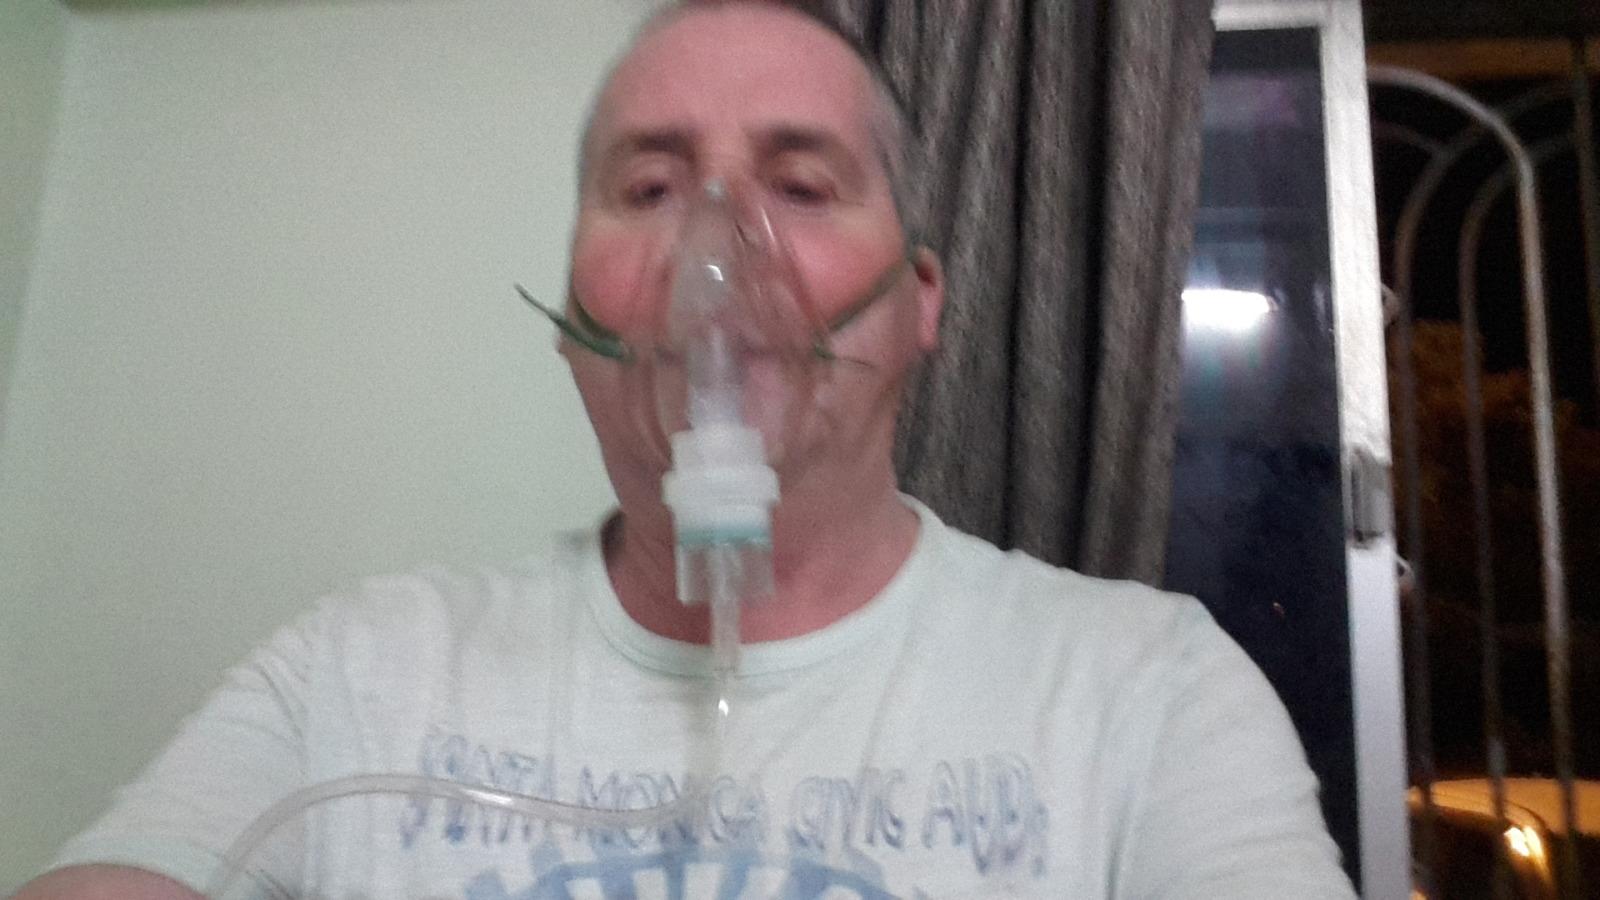 Garry McGivern on a nebuliser